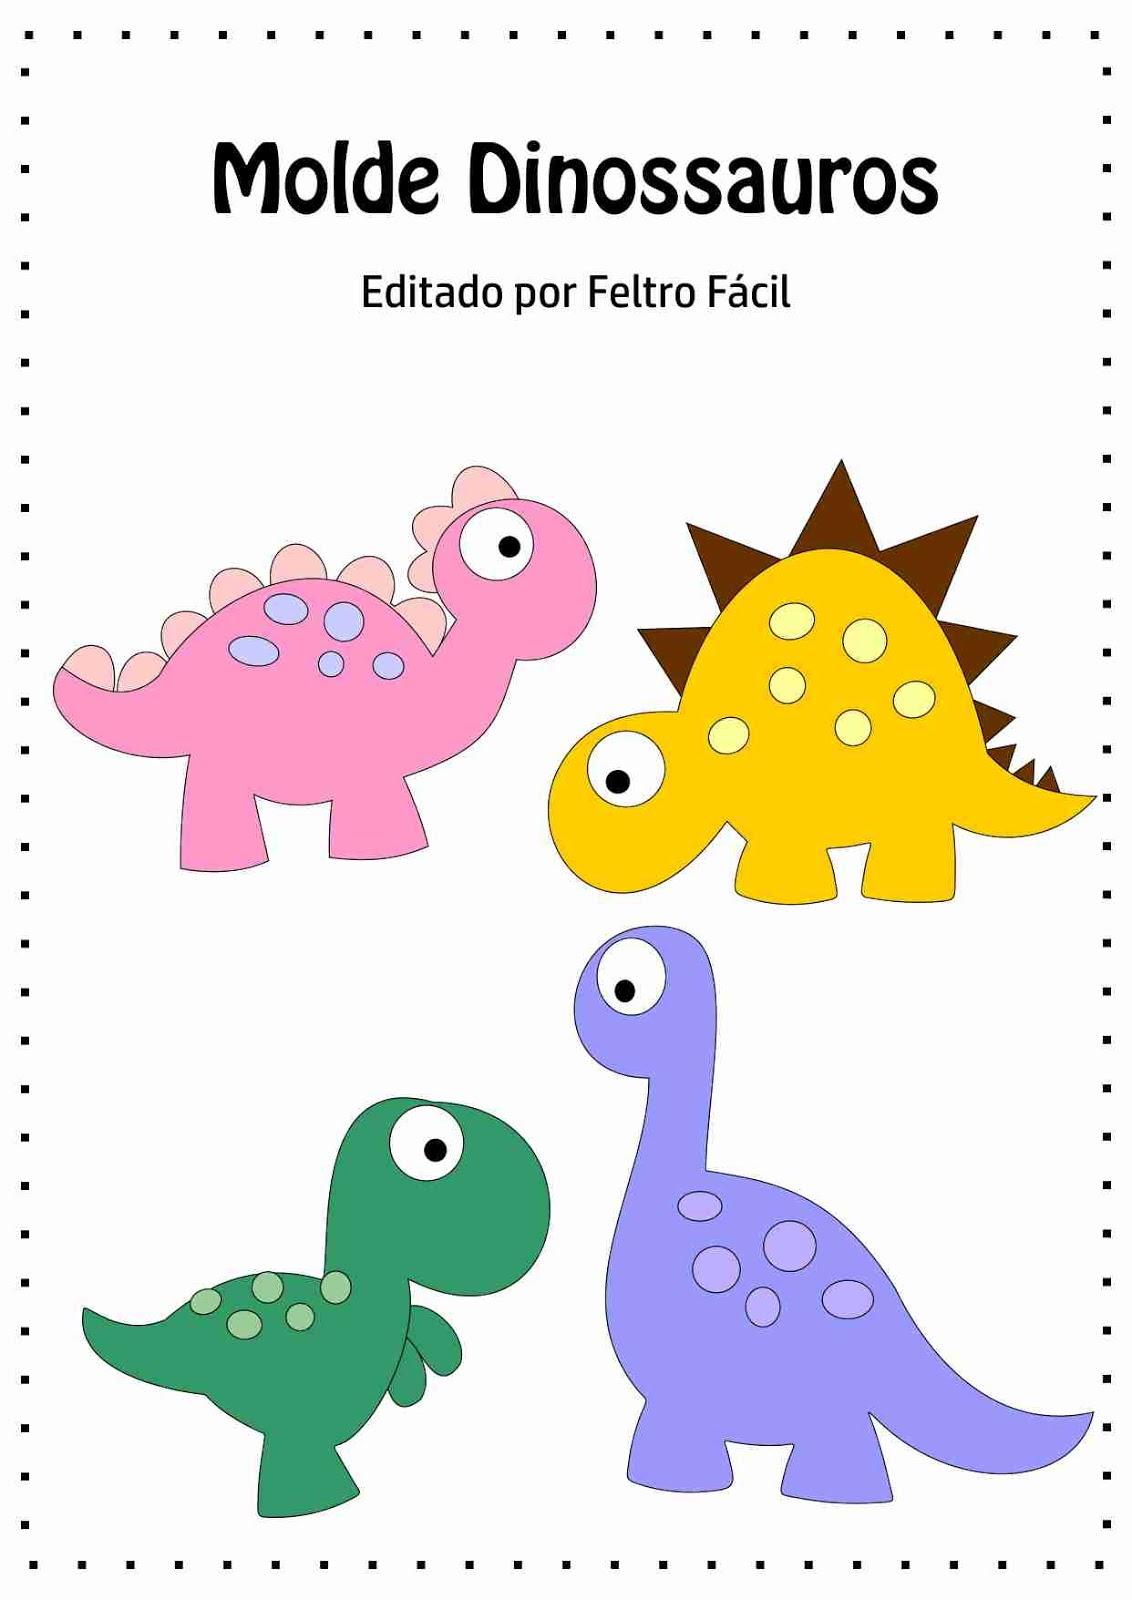 Well-known Feltro Fácil Moldes e Apostilas: Molde de Dinossauros em Feltro! VJ66